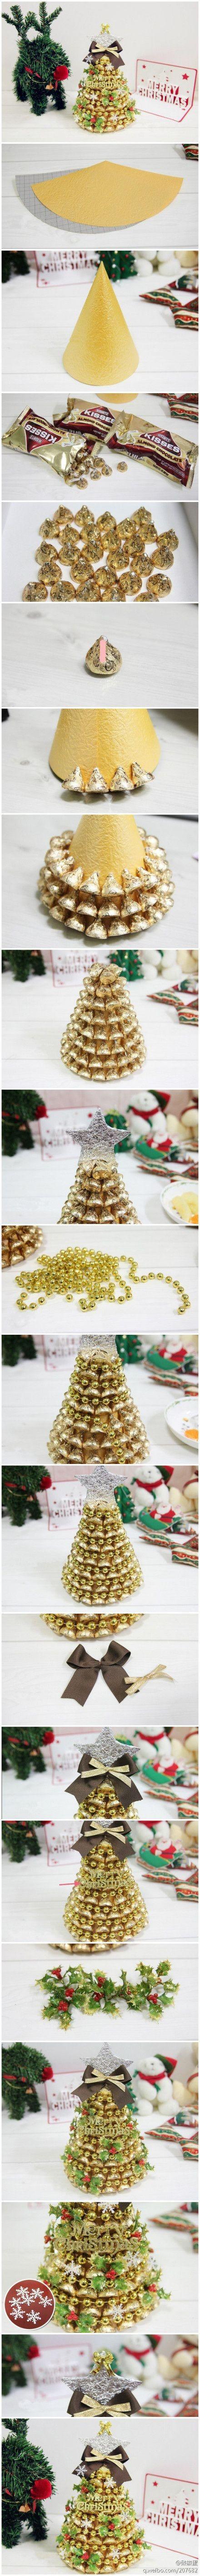 Hershey Kisses Christmas Tree ***materials (gold paper, hershey kisses, double sided tape, aluminum foil, ornaments, ribbon)